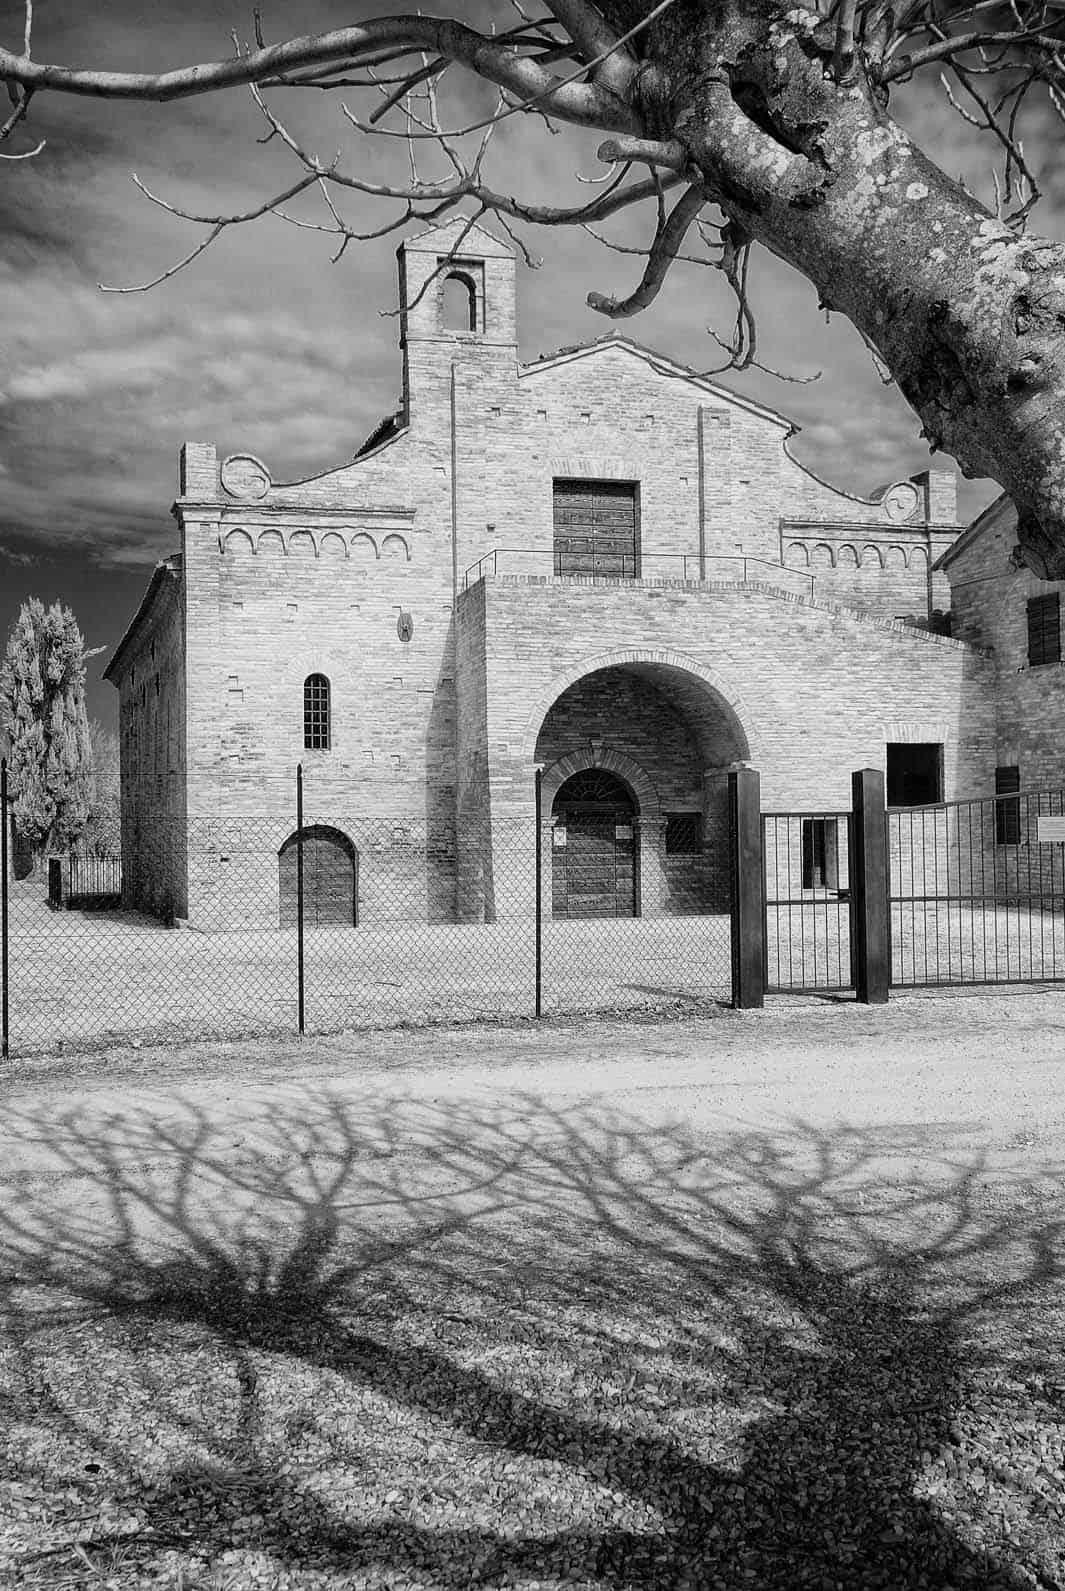 Abbazia Imperiale di Santa Croce, Casette d'Ete